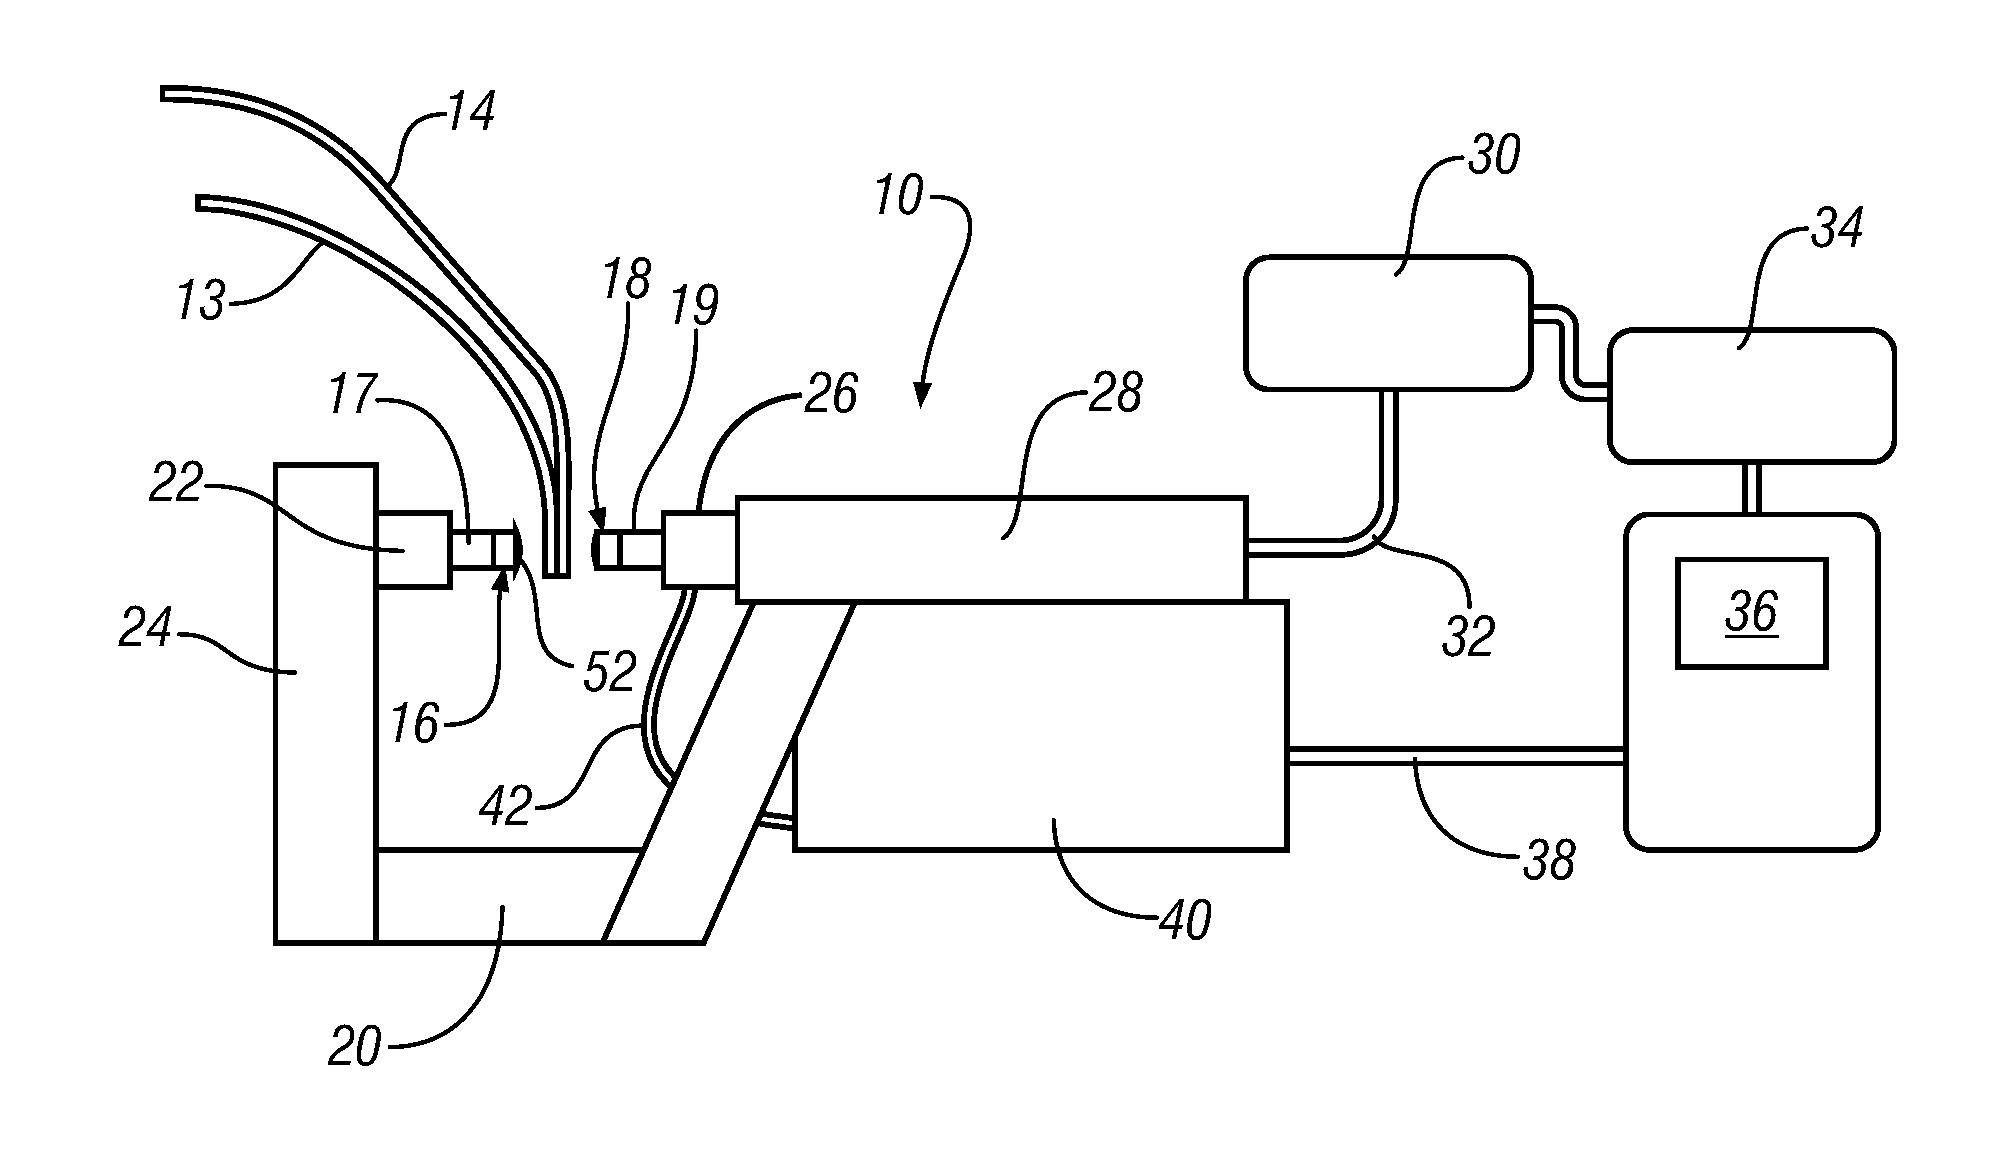 spot welder wiring diagram 1965 mustang headlight switch industrial mig 100